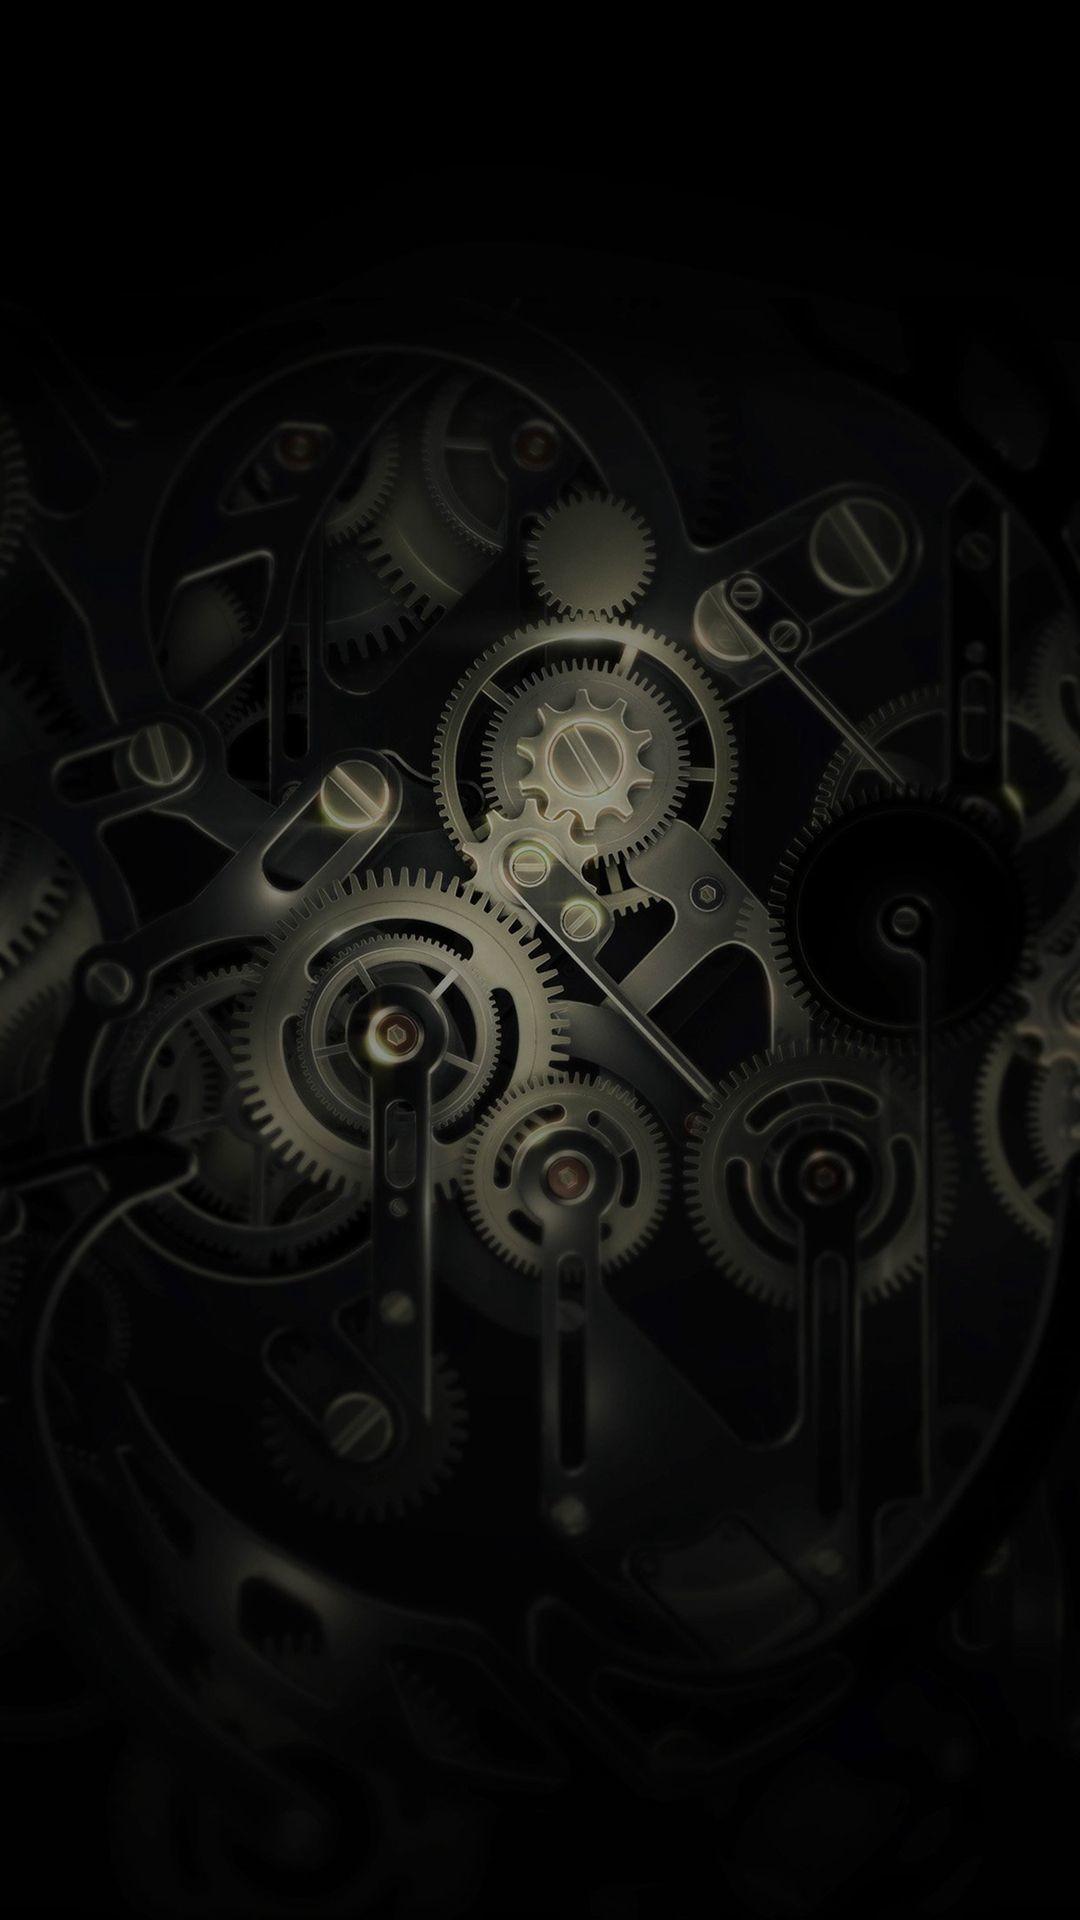 Res: 1080x1920, Huawei Mate Gear Dark Illust Art iPhone 6 wallpaper